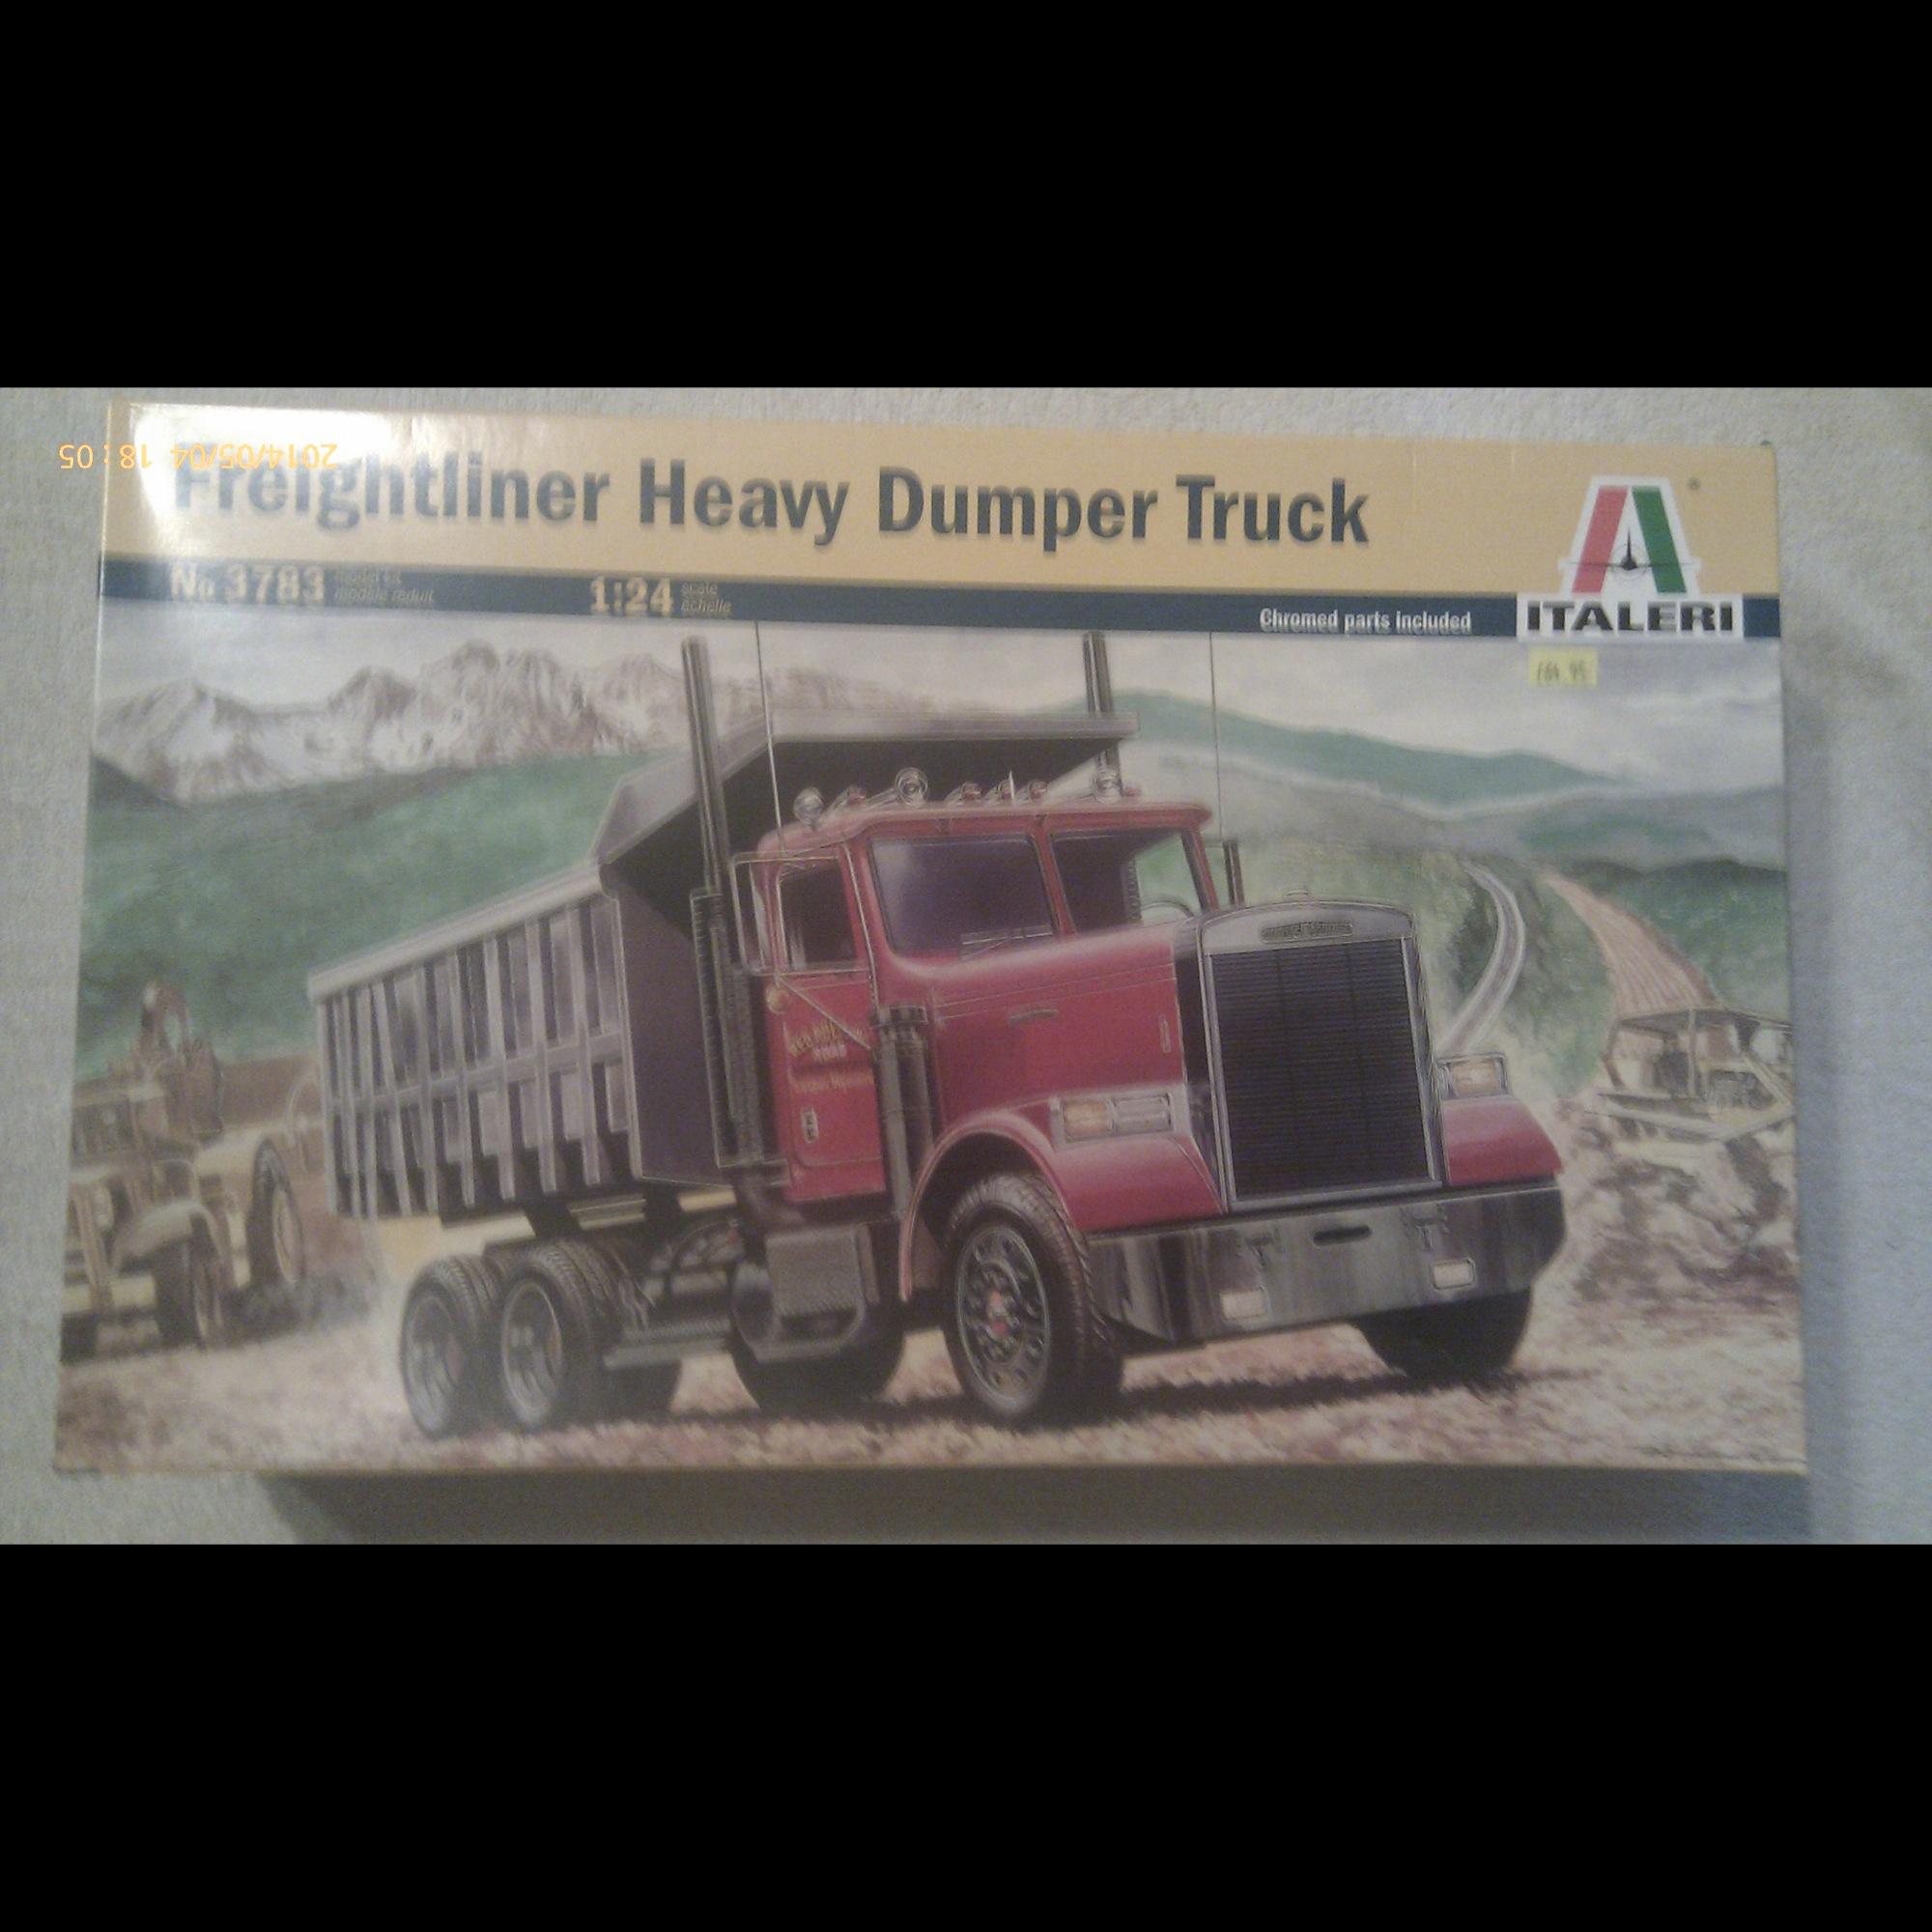 Freightliner Heavy Dumper Truck